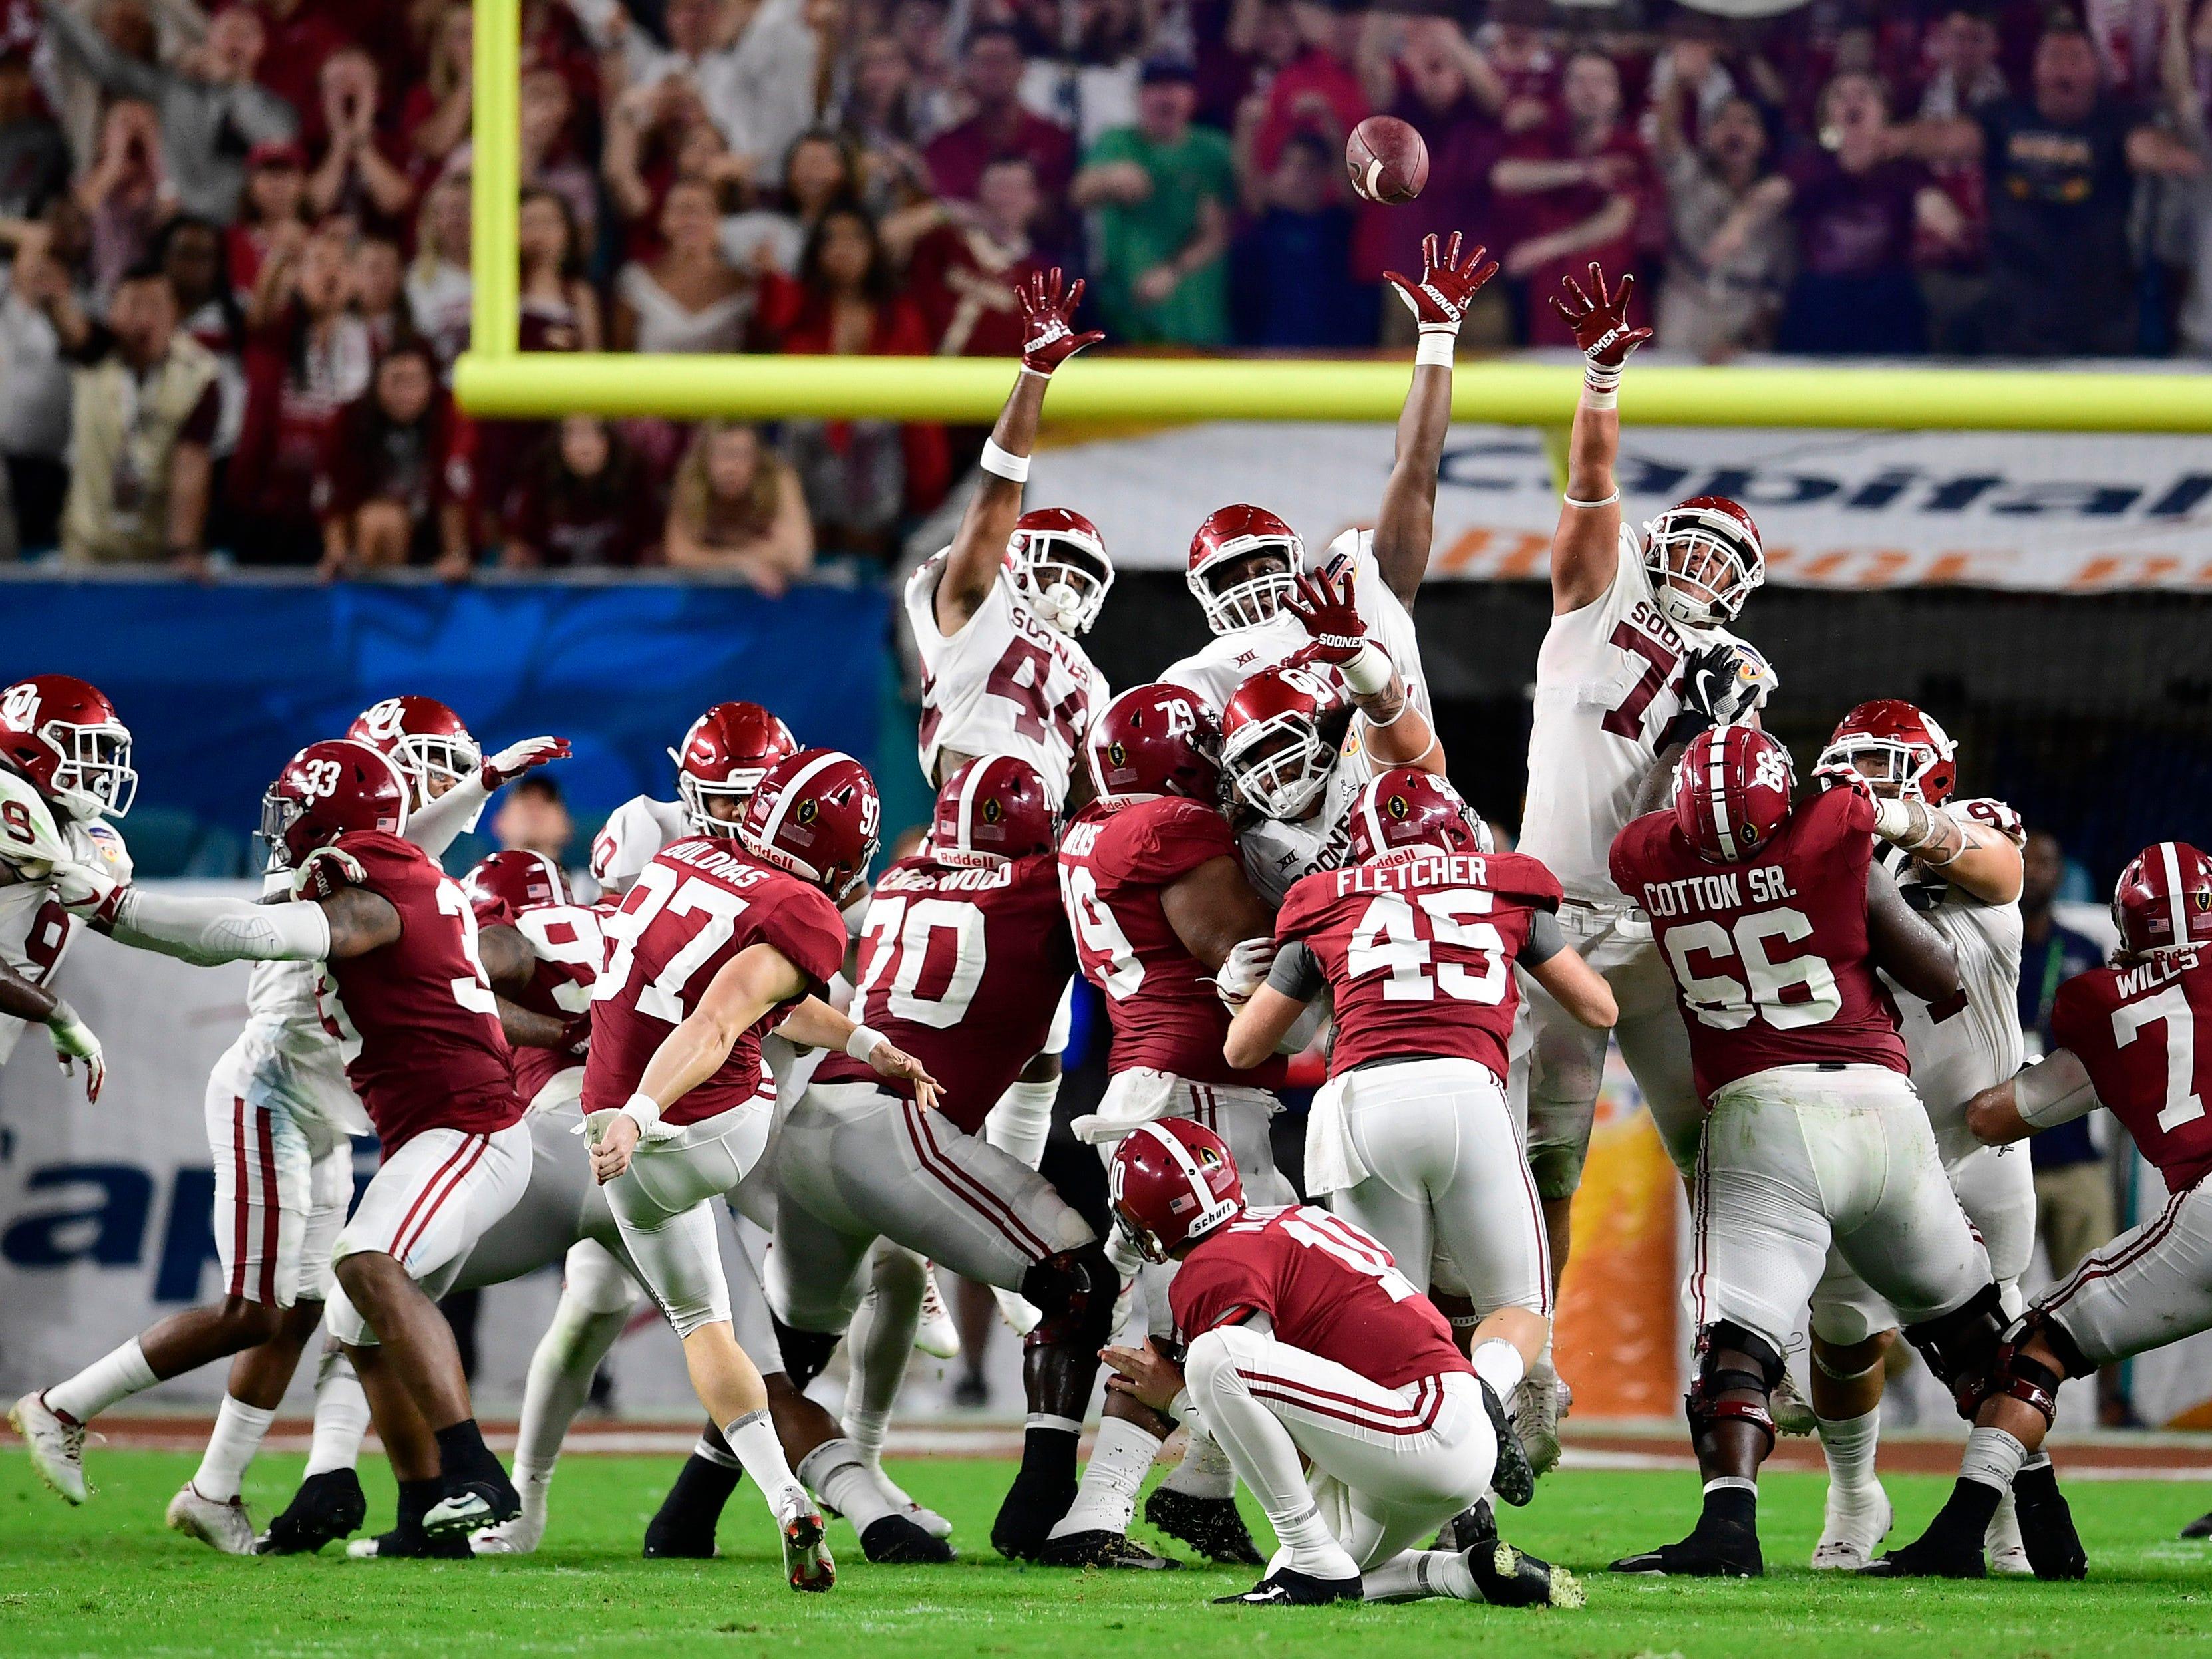 Orange Bowl: Alabama place kicker Joseph Bulovas kicks a field goal.